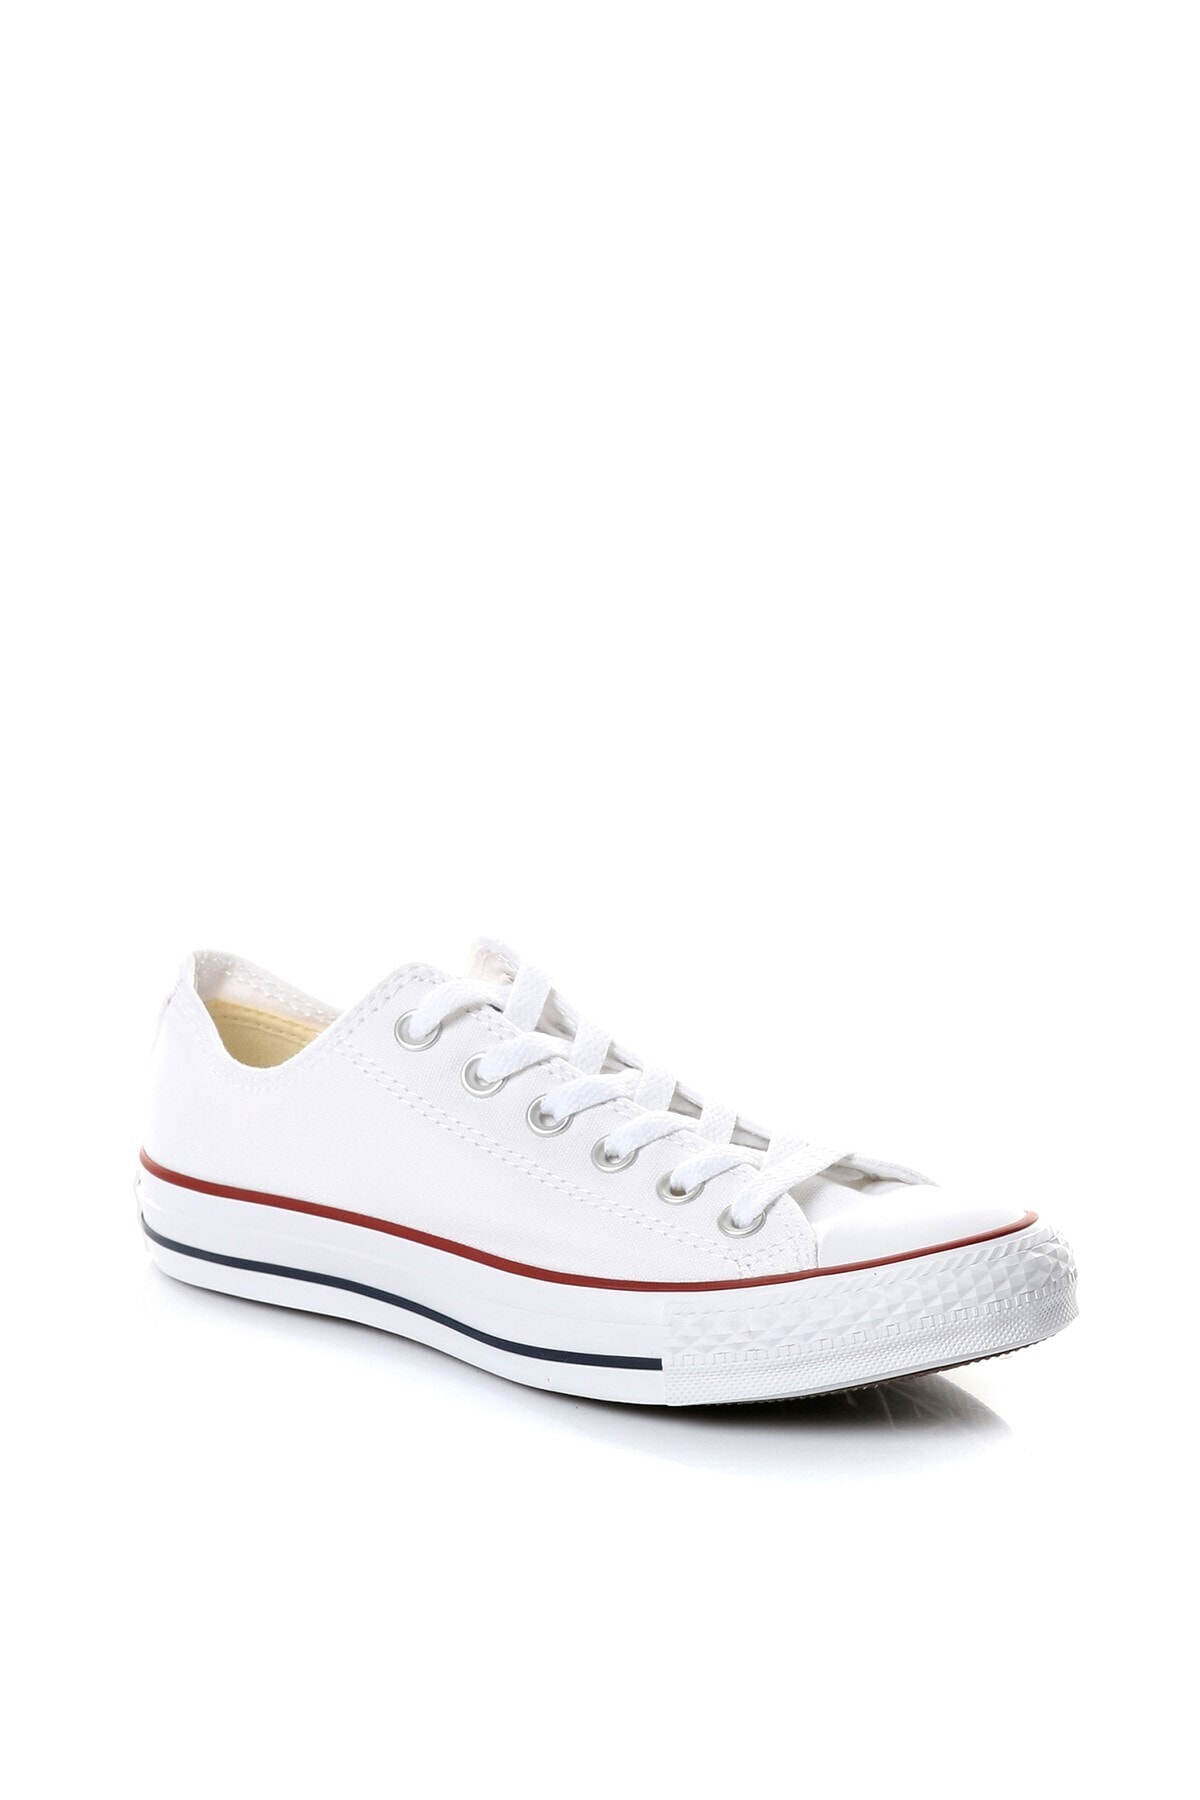 converse Beyaz Kadın / Kız Sneaker M7652c Chuck Taylor All Star Optıcal White Canvas 1